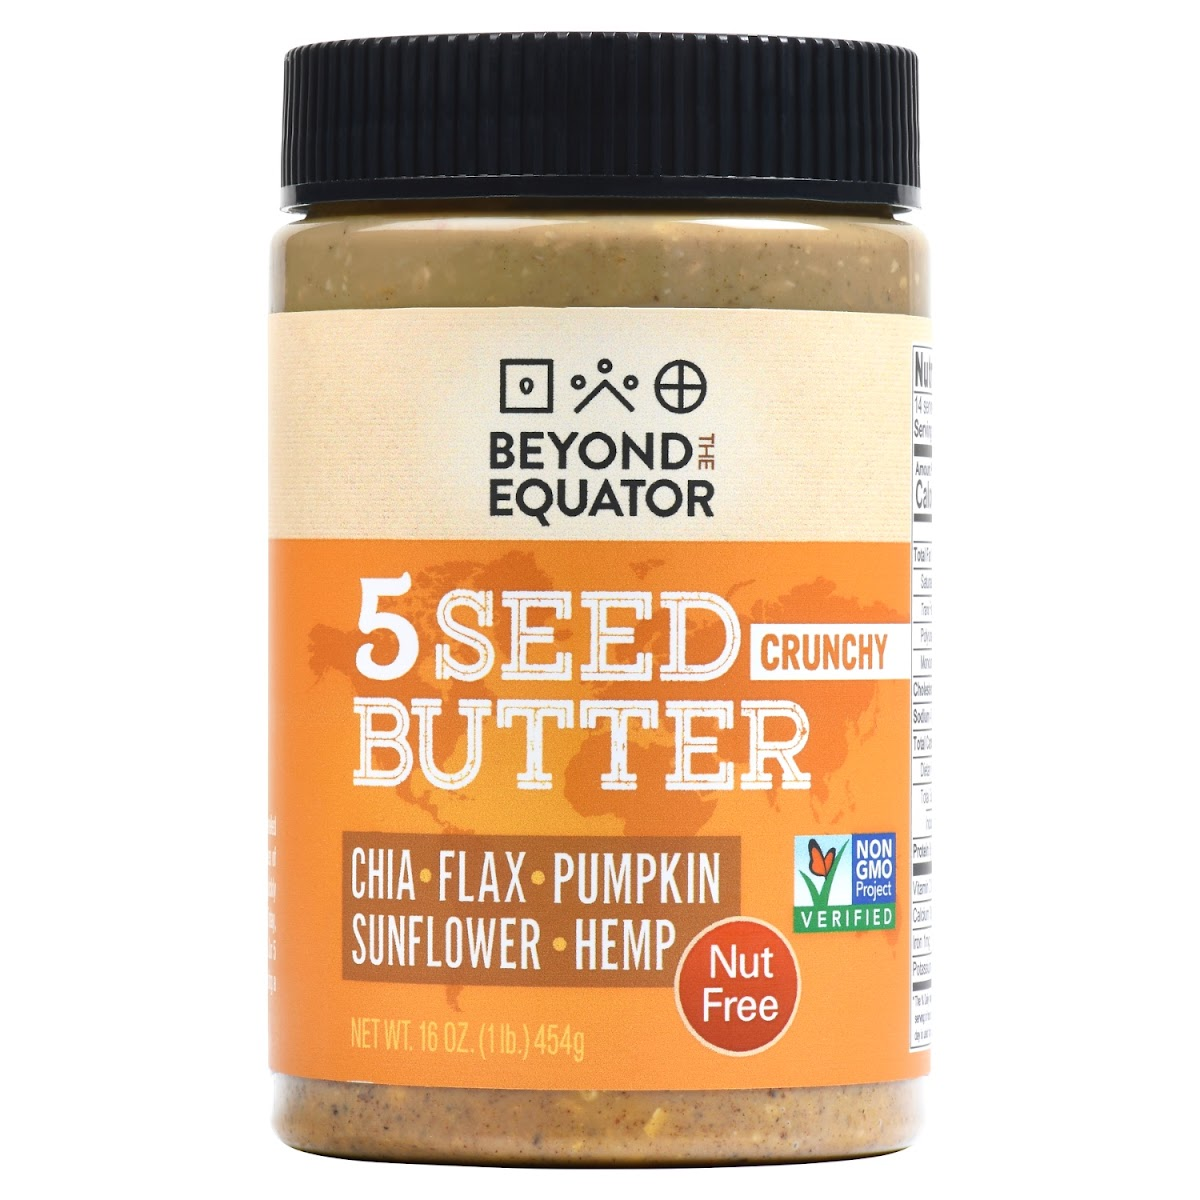 5 Seed Butter - Crunchy